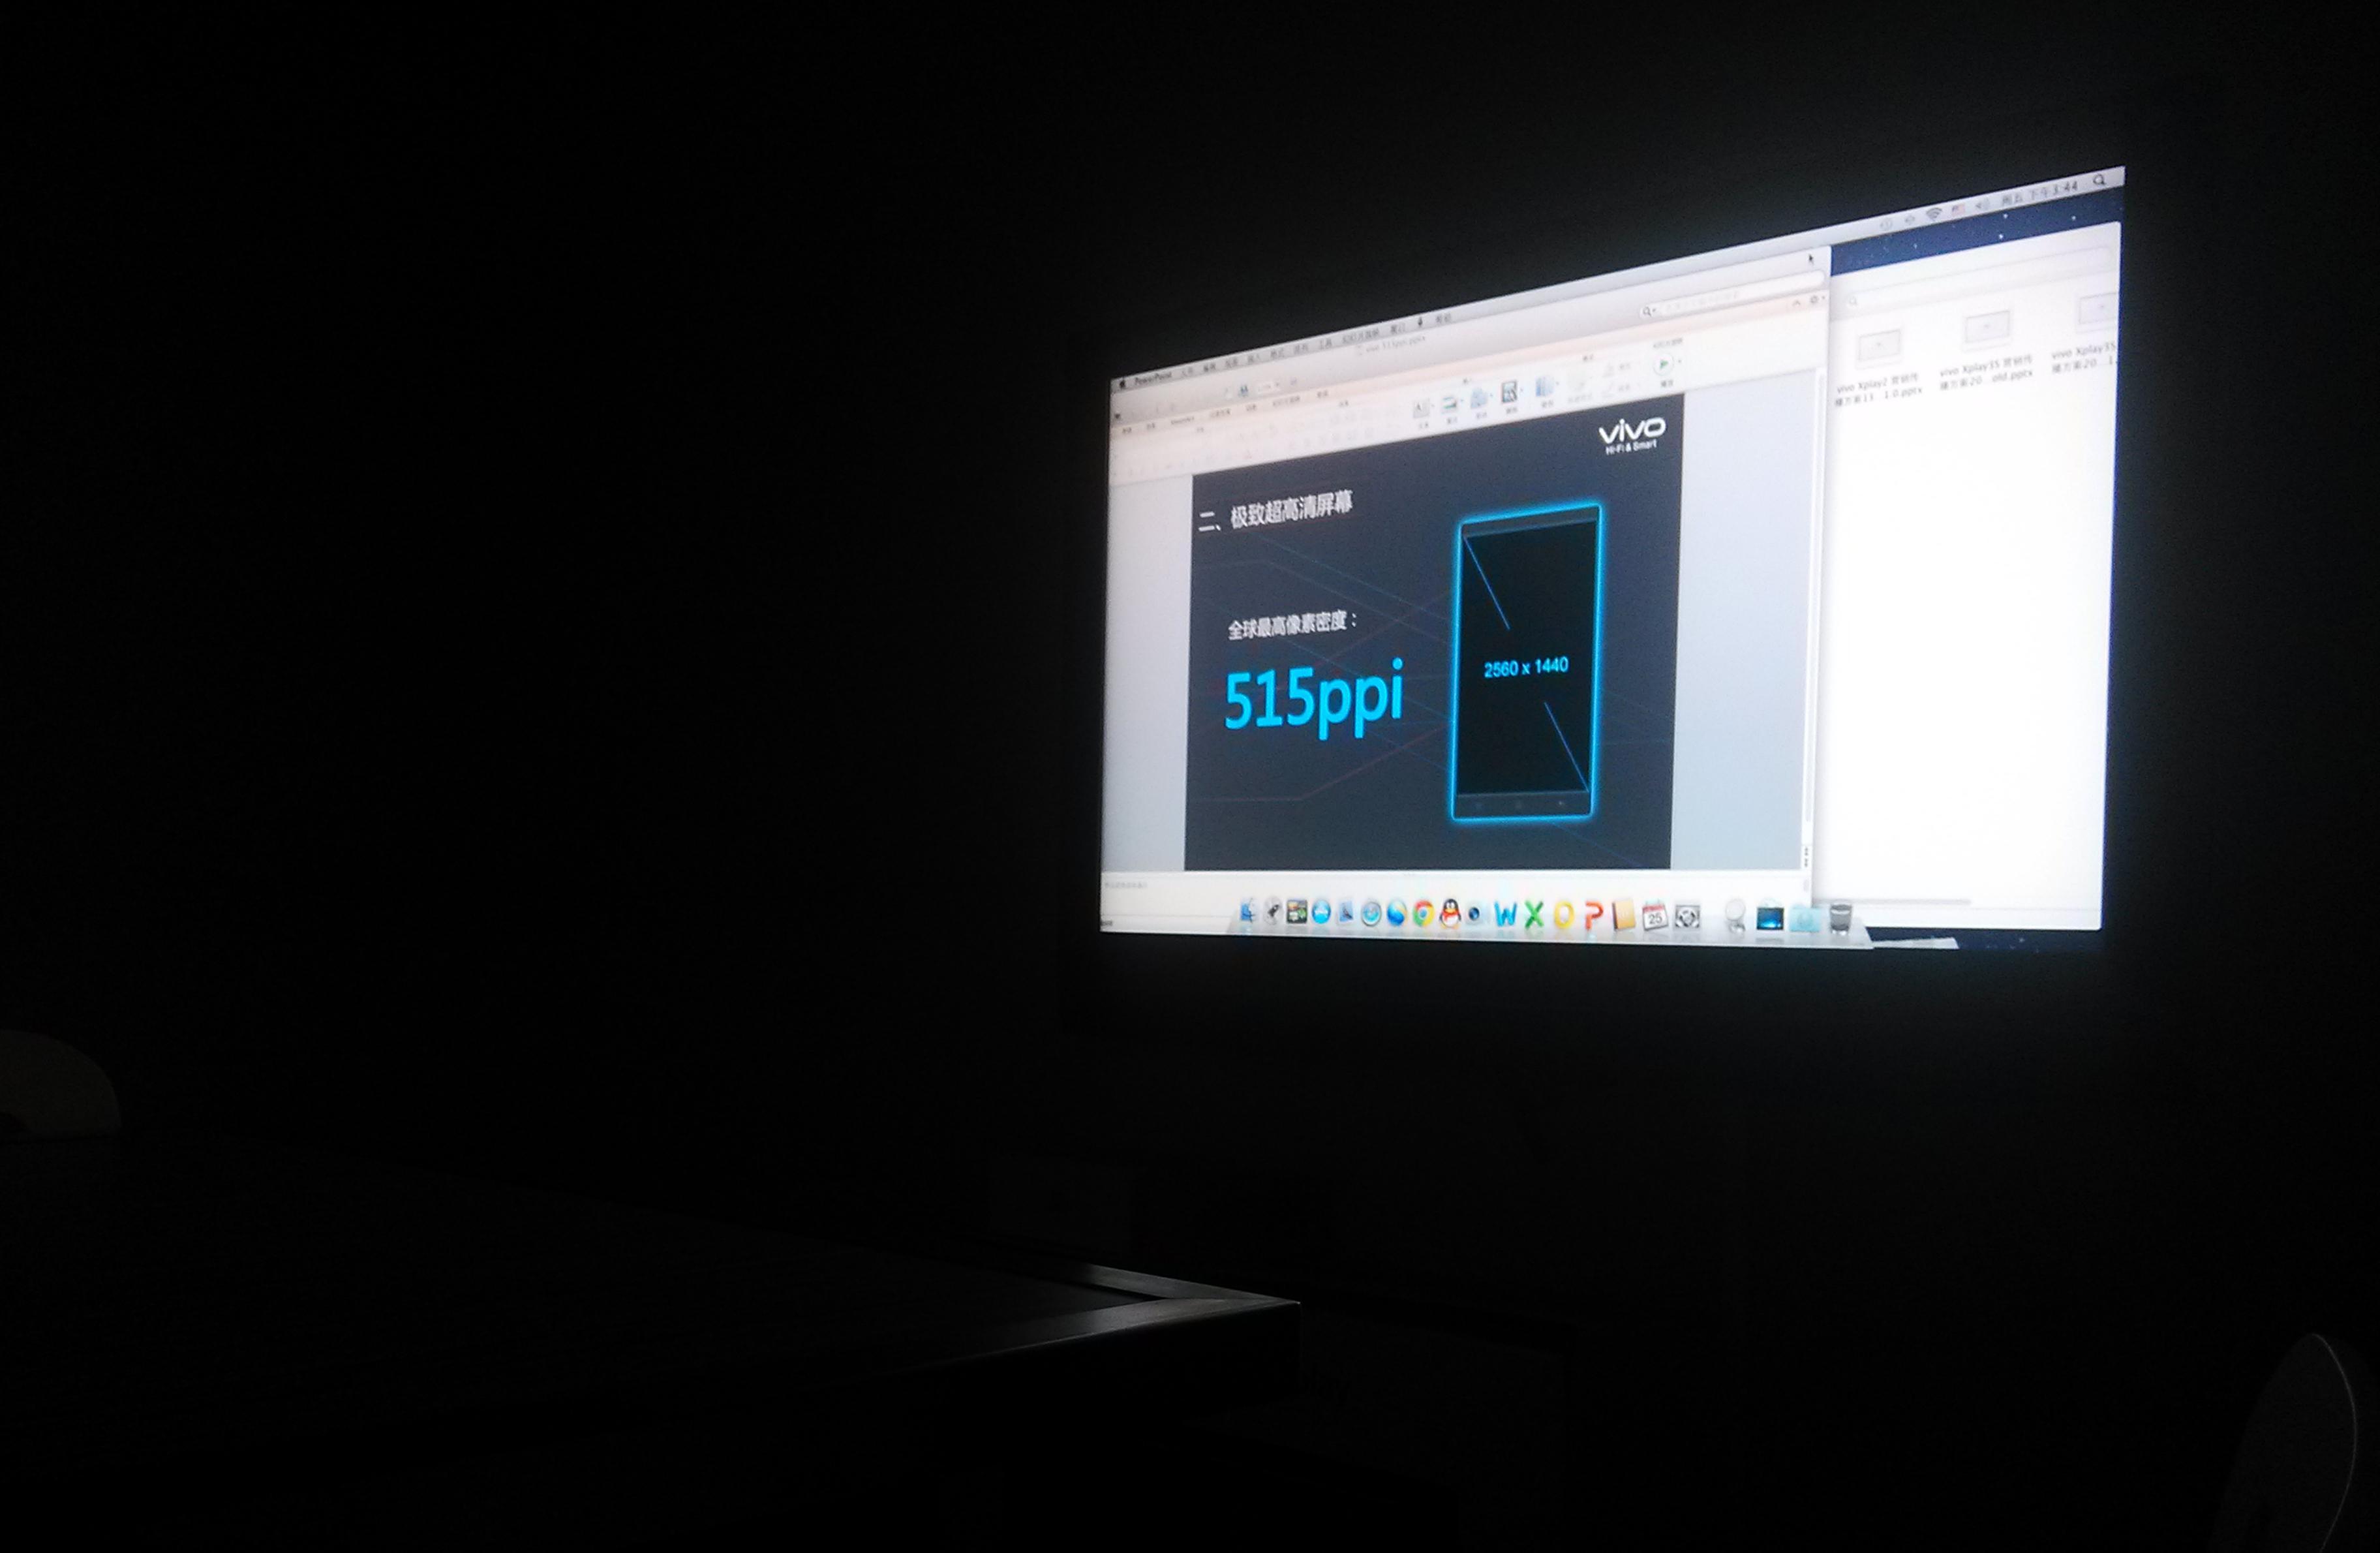 vivo Xplay 3S 5.7英寸超视网膜级别参数曝光:515ppi